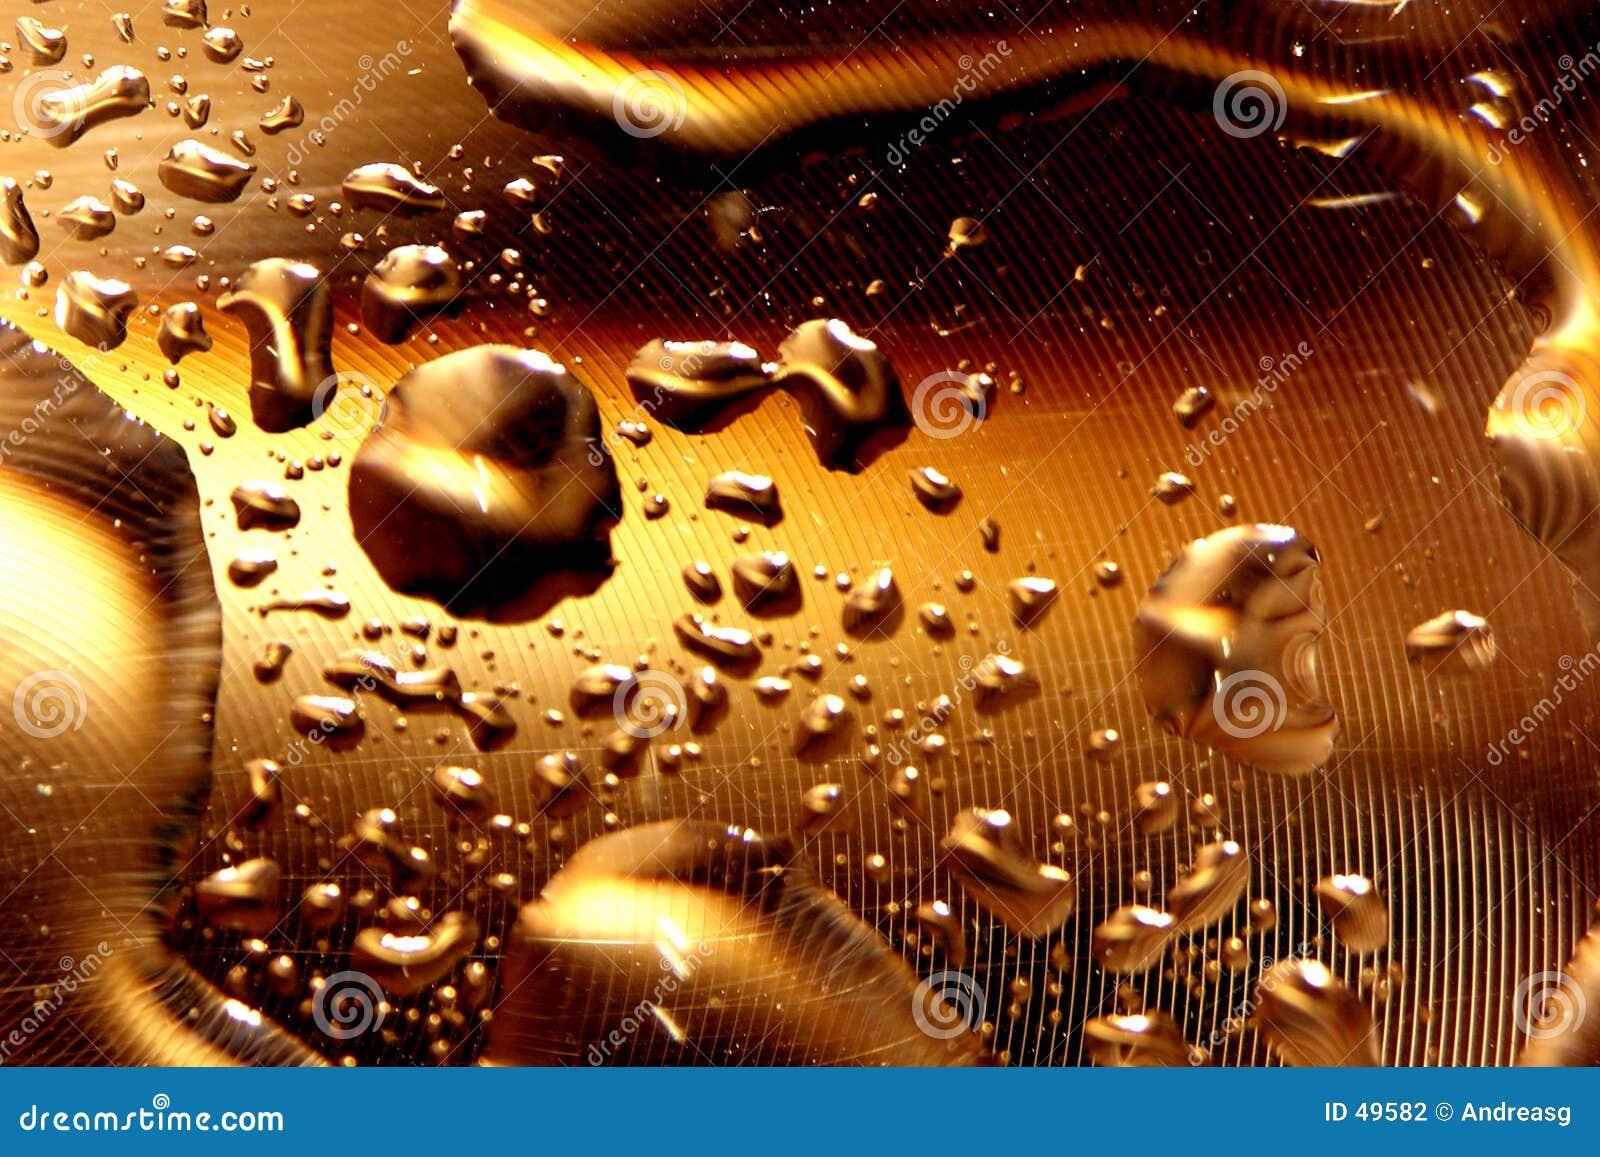 Water drops - deep gold